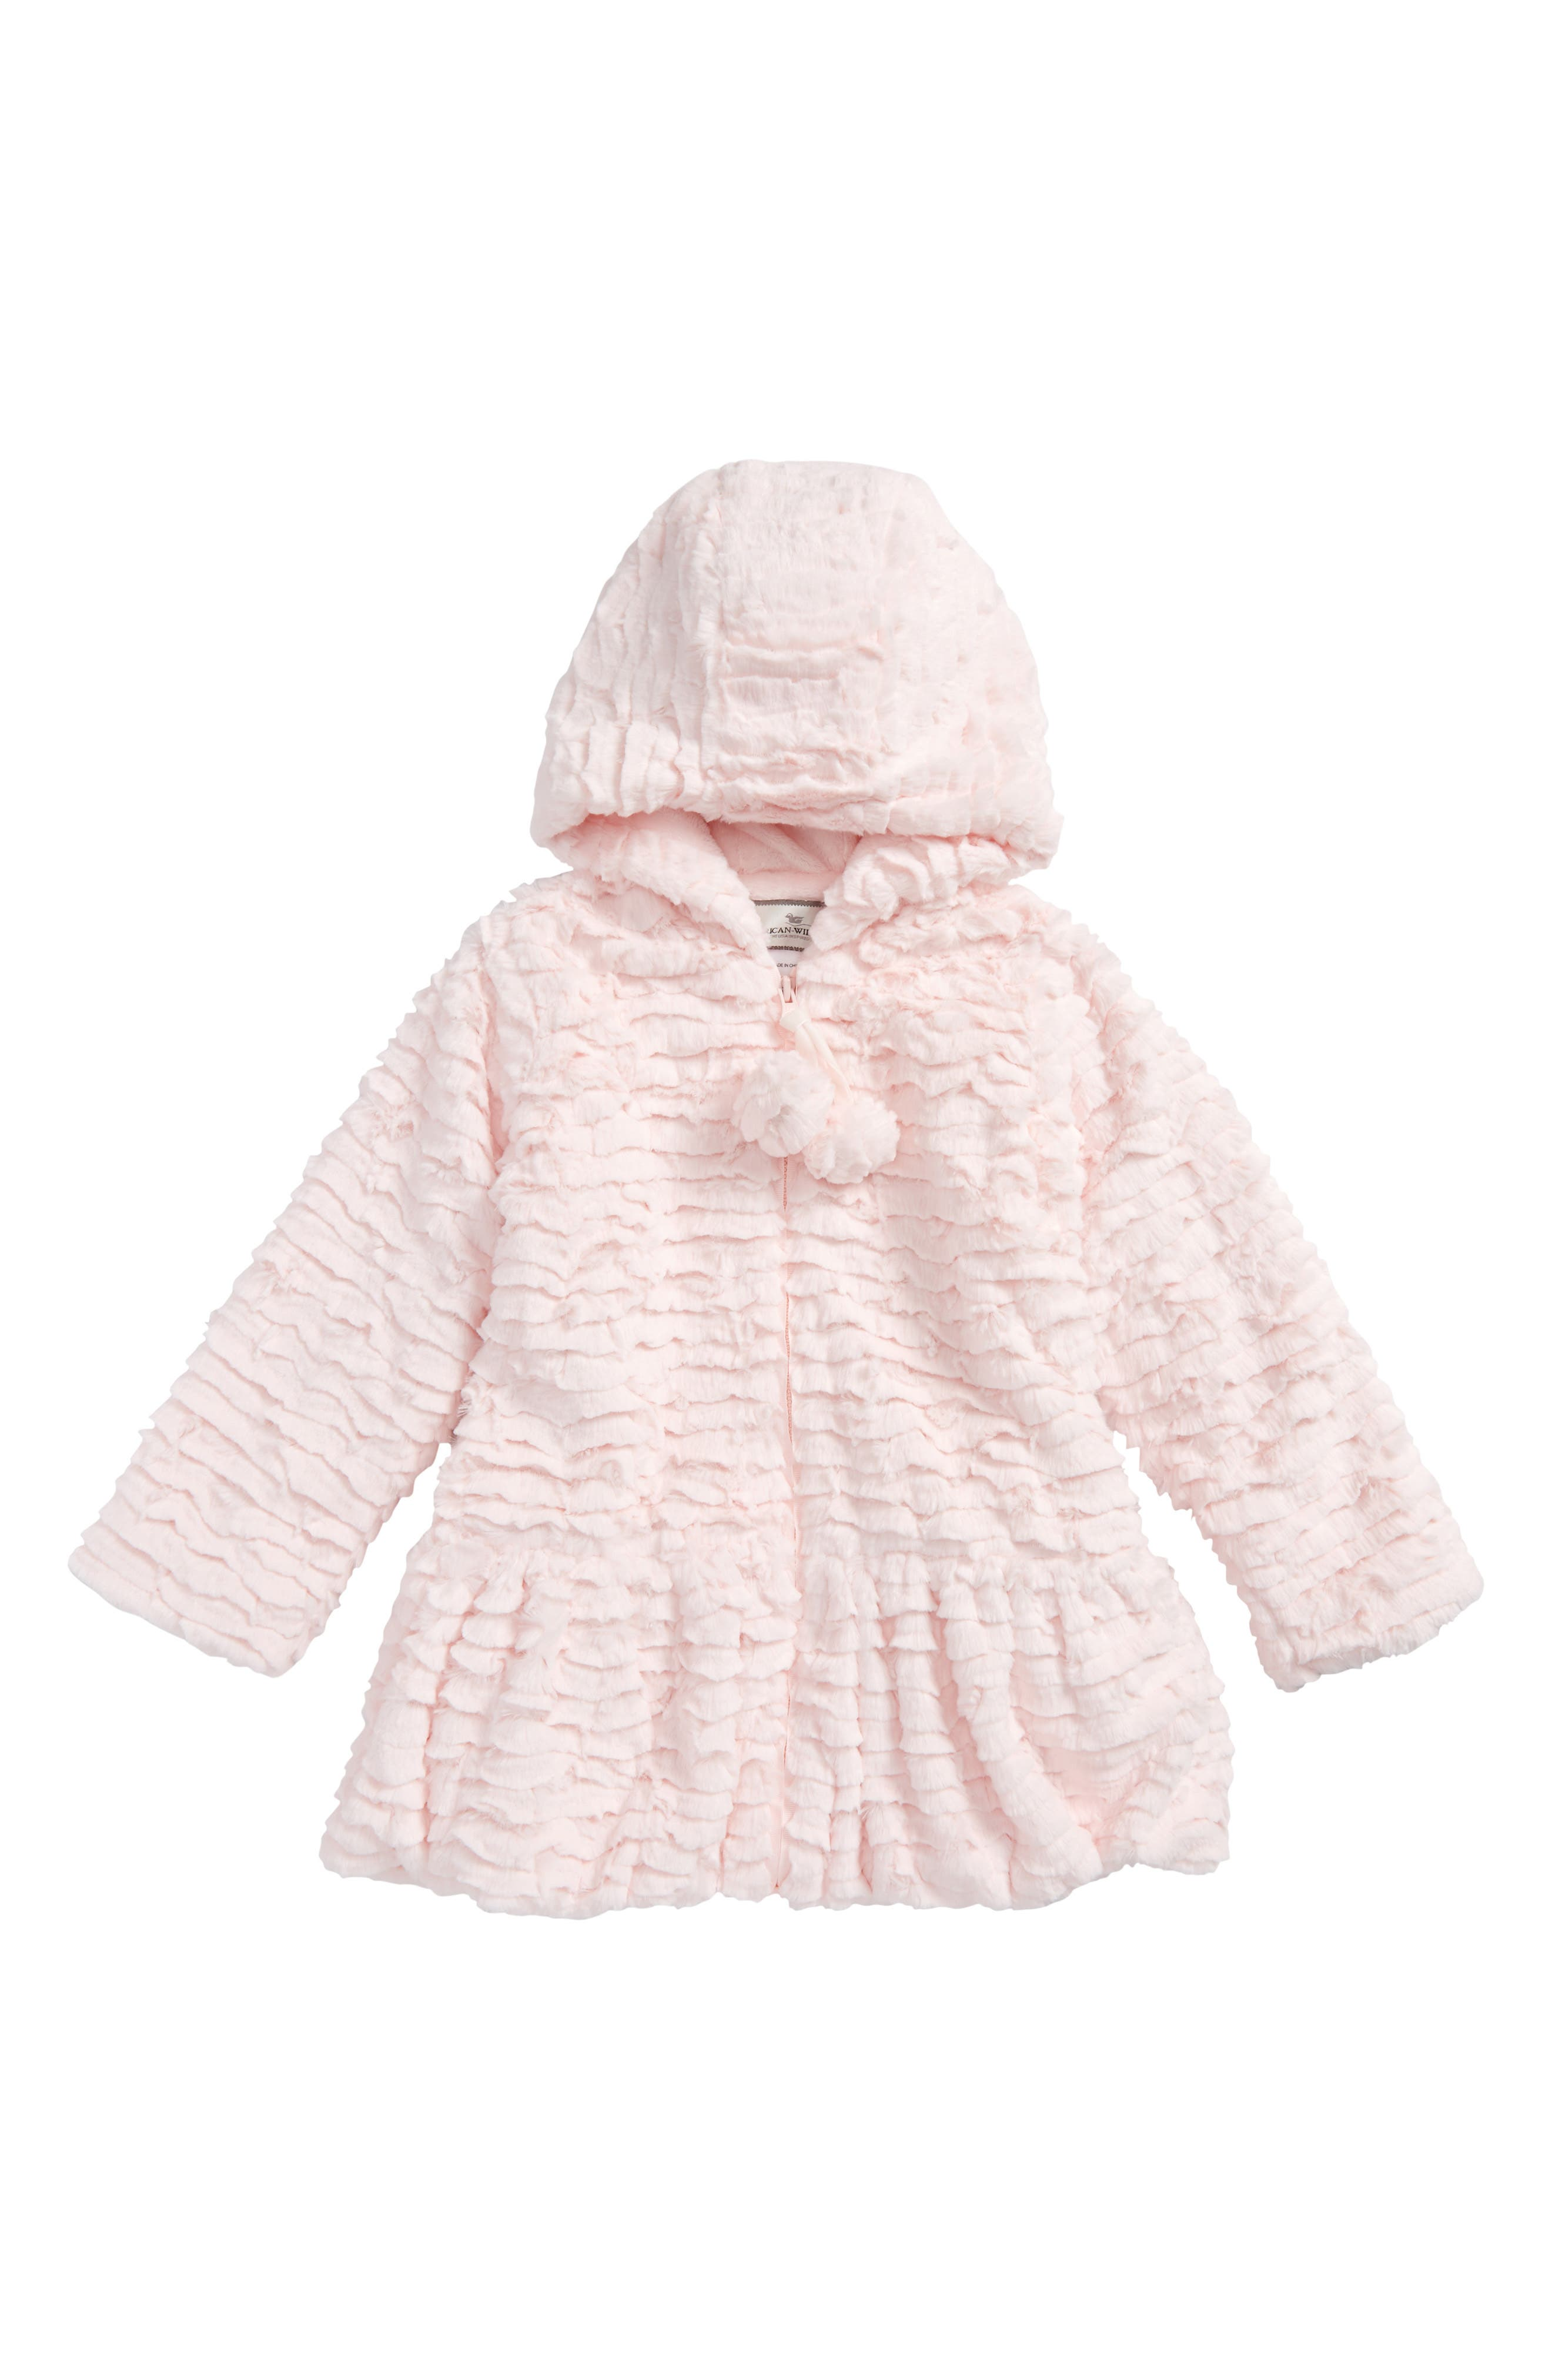 Faux Fur Hooded Peplum Coat,                             Main thumbnail 1, color,                             Pink Sandstone